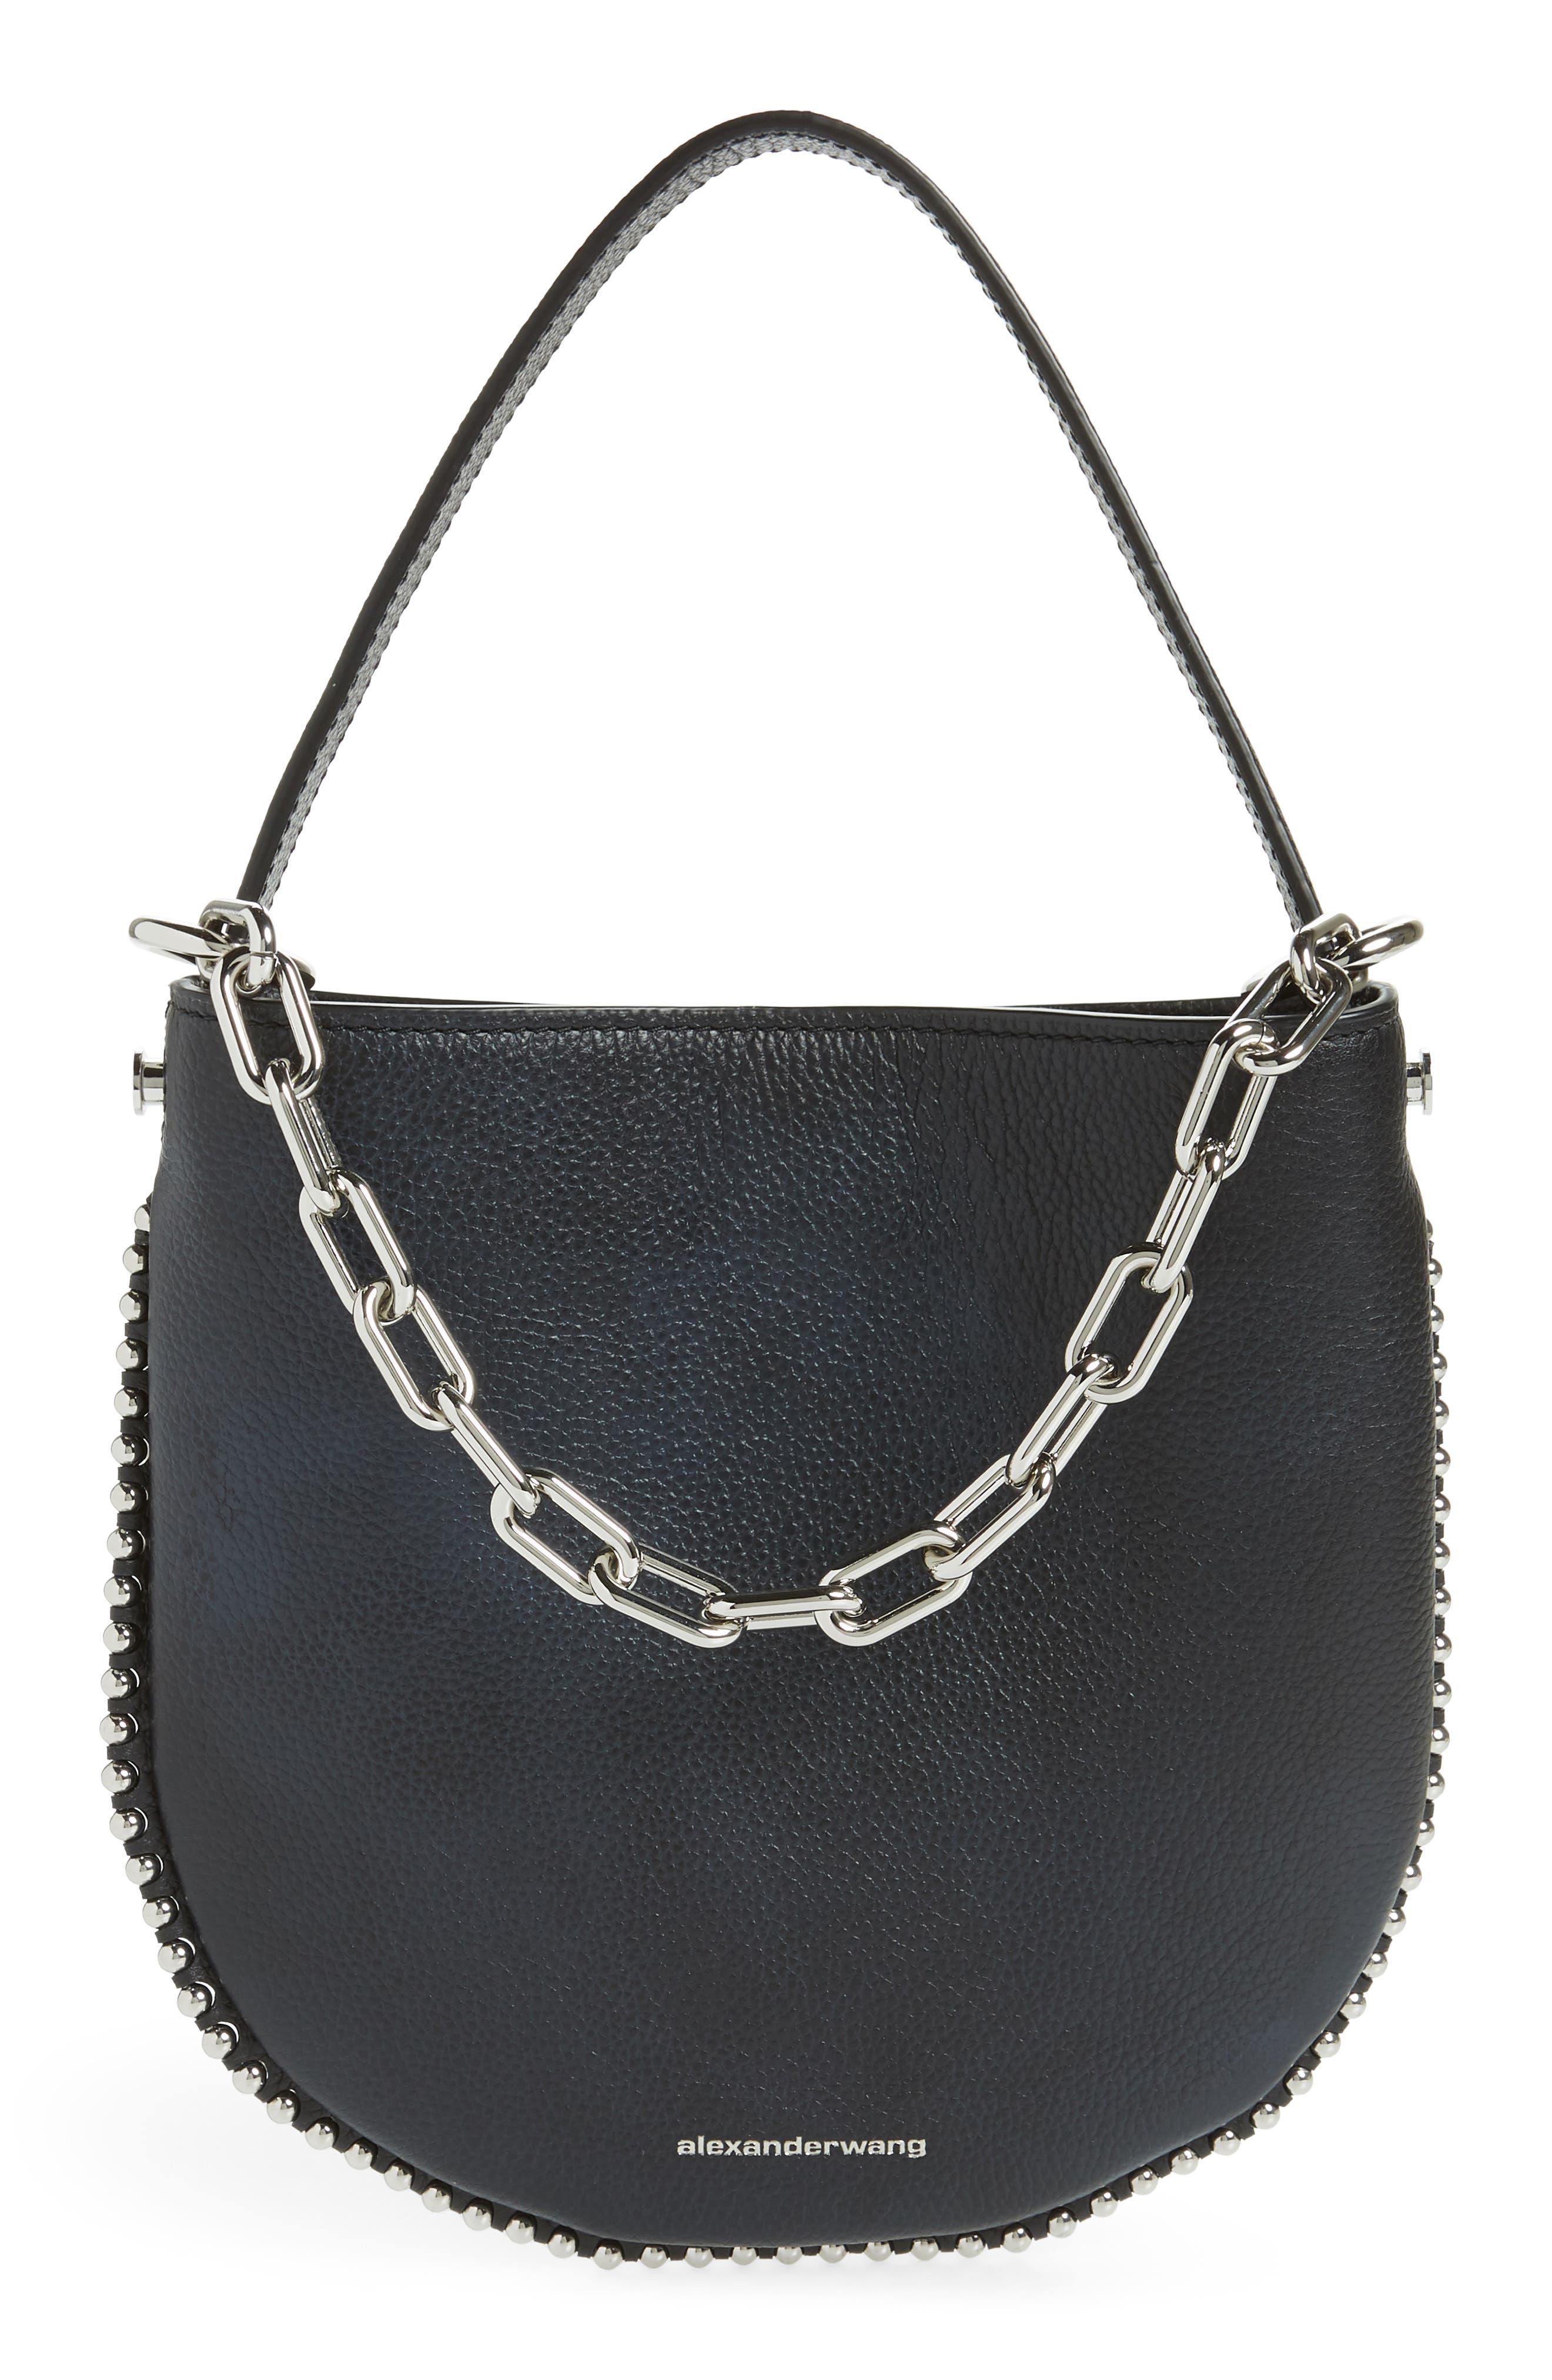 ALEXANDER WANG,                             Mini Roxy Leather Hobo Bag,                             Main thumbnail 1, color,                             BLACK/ WHITE